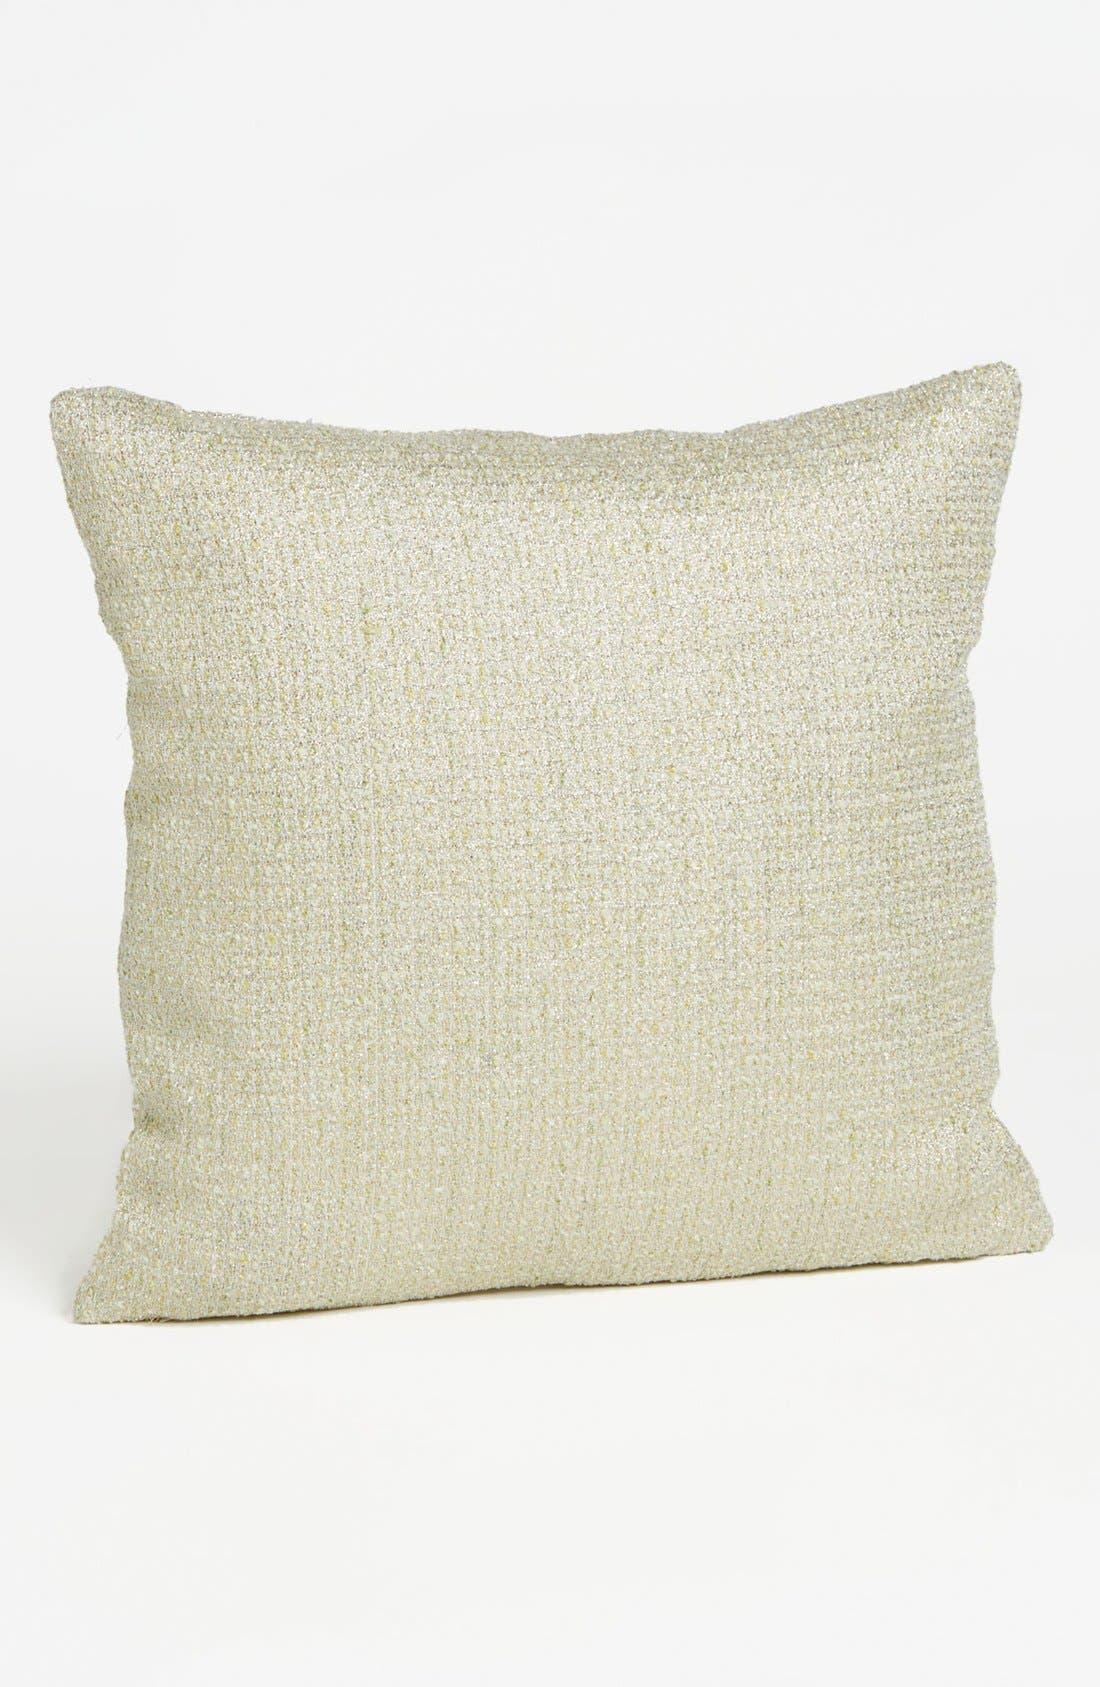 Main Image - Vince Camuto 'Bal Harbour' Metallic Pillow